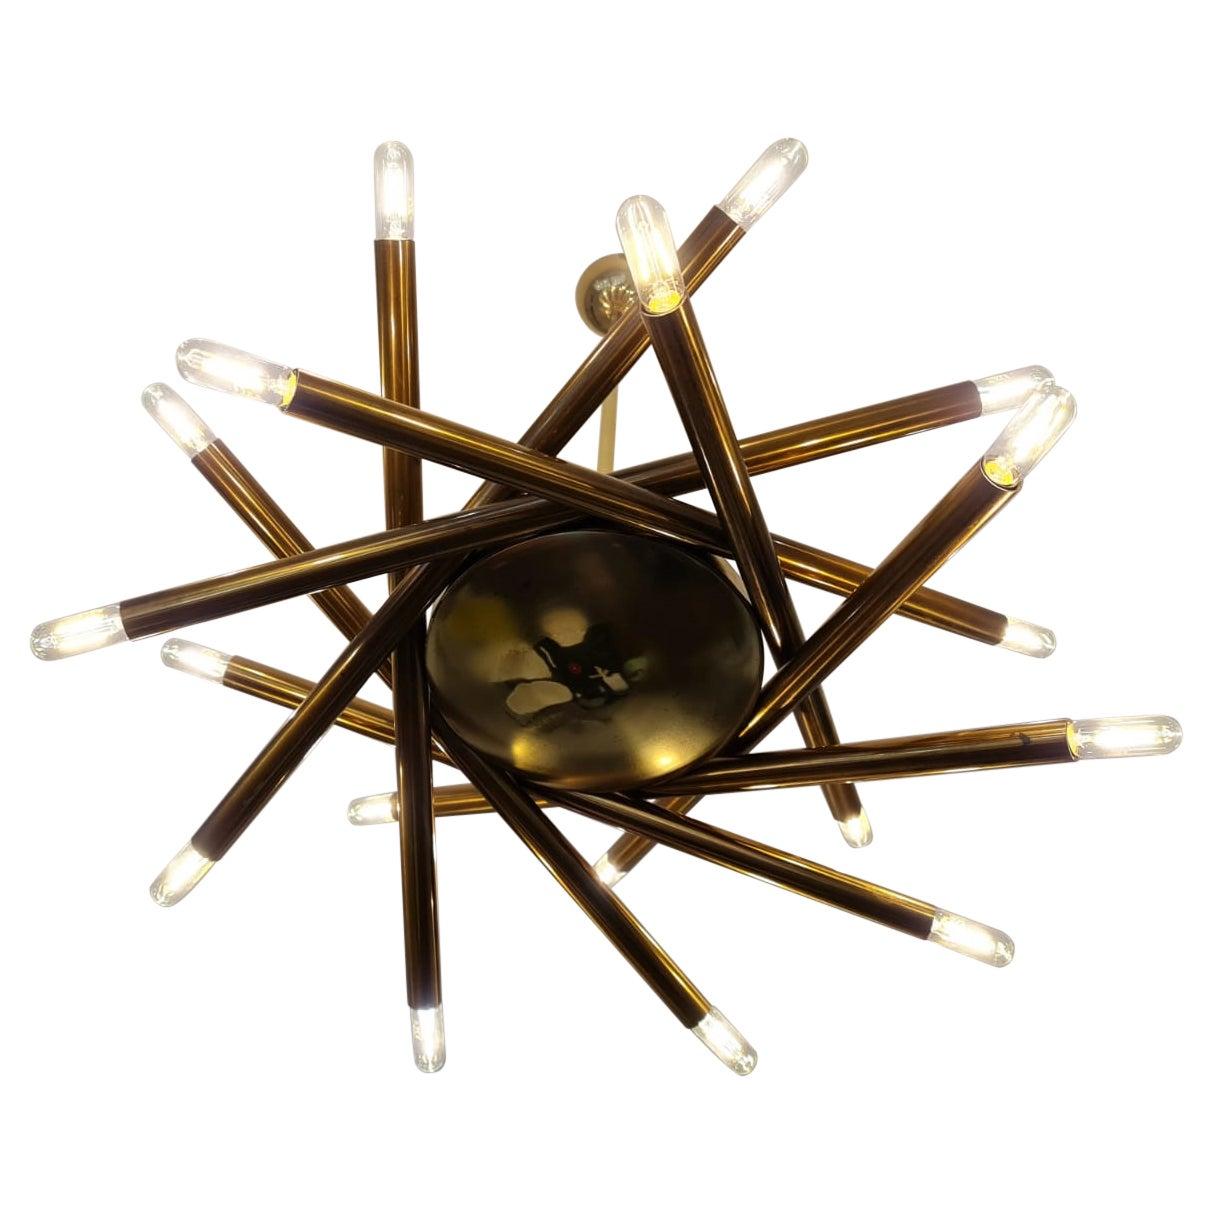 Rare Original Brass Sputnik Ceiling Lamp by Stilnovo, Italy, 1950